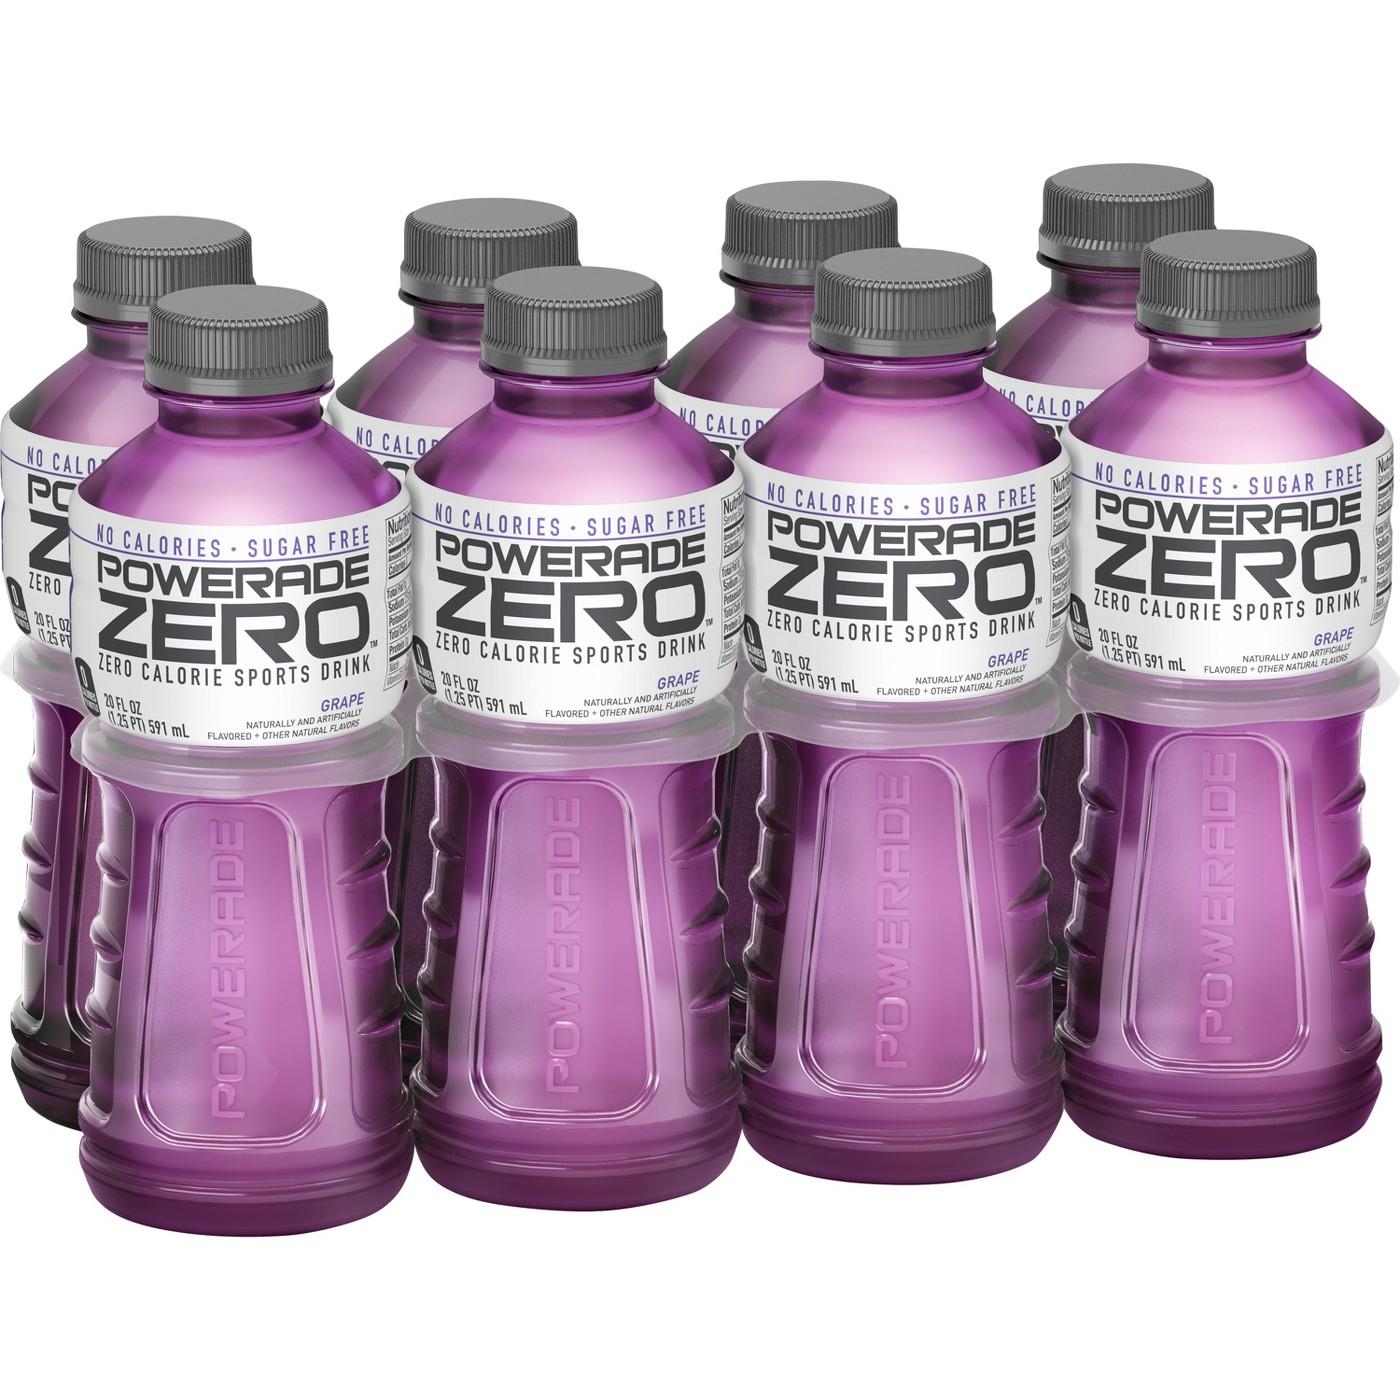 POWERADE Zero Grape Sports Drink - 8pk/20 fl oz Bottles - image 1 of 5